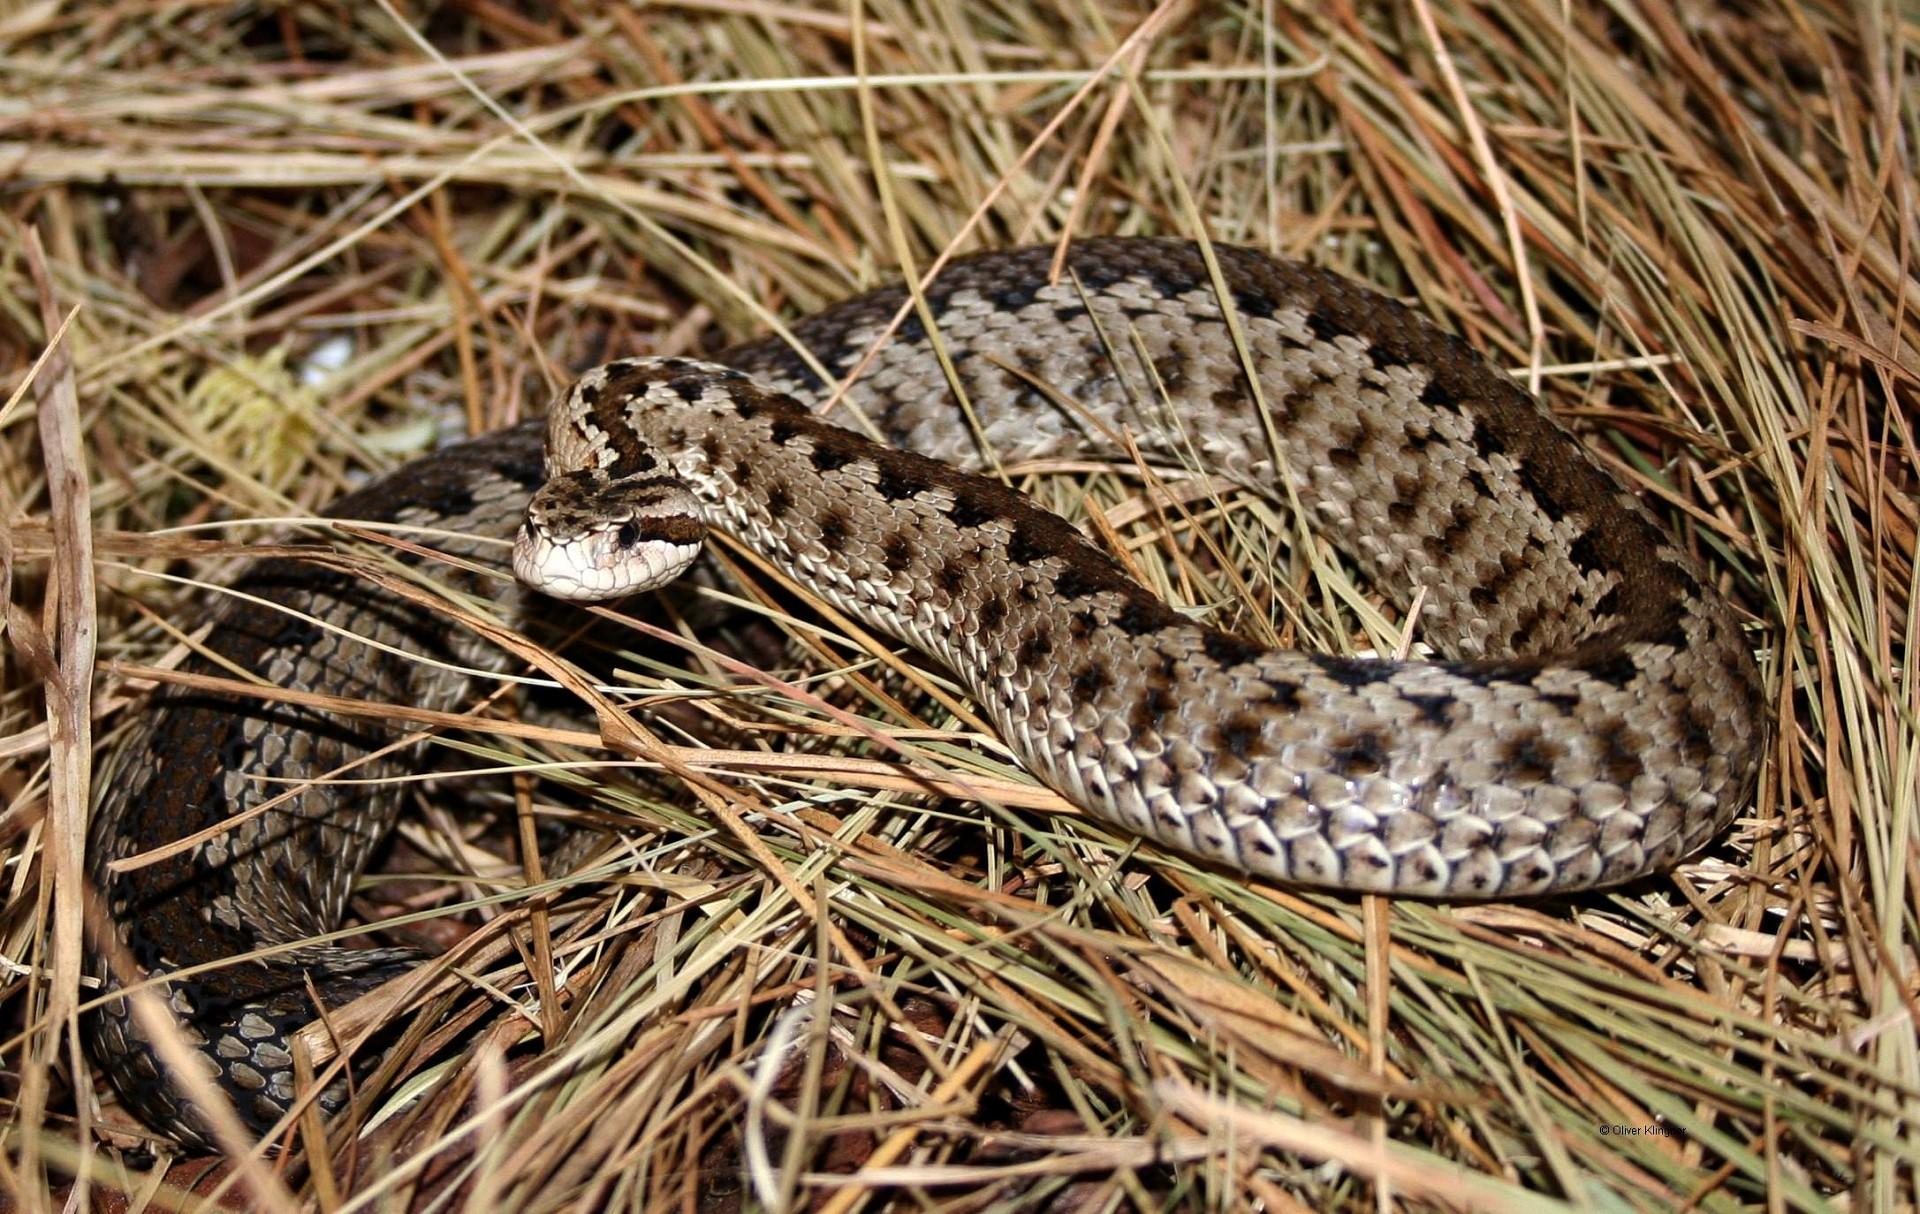 для мусульман змеи живущие в башкортостане с фото наличие них энтузиазма